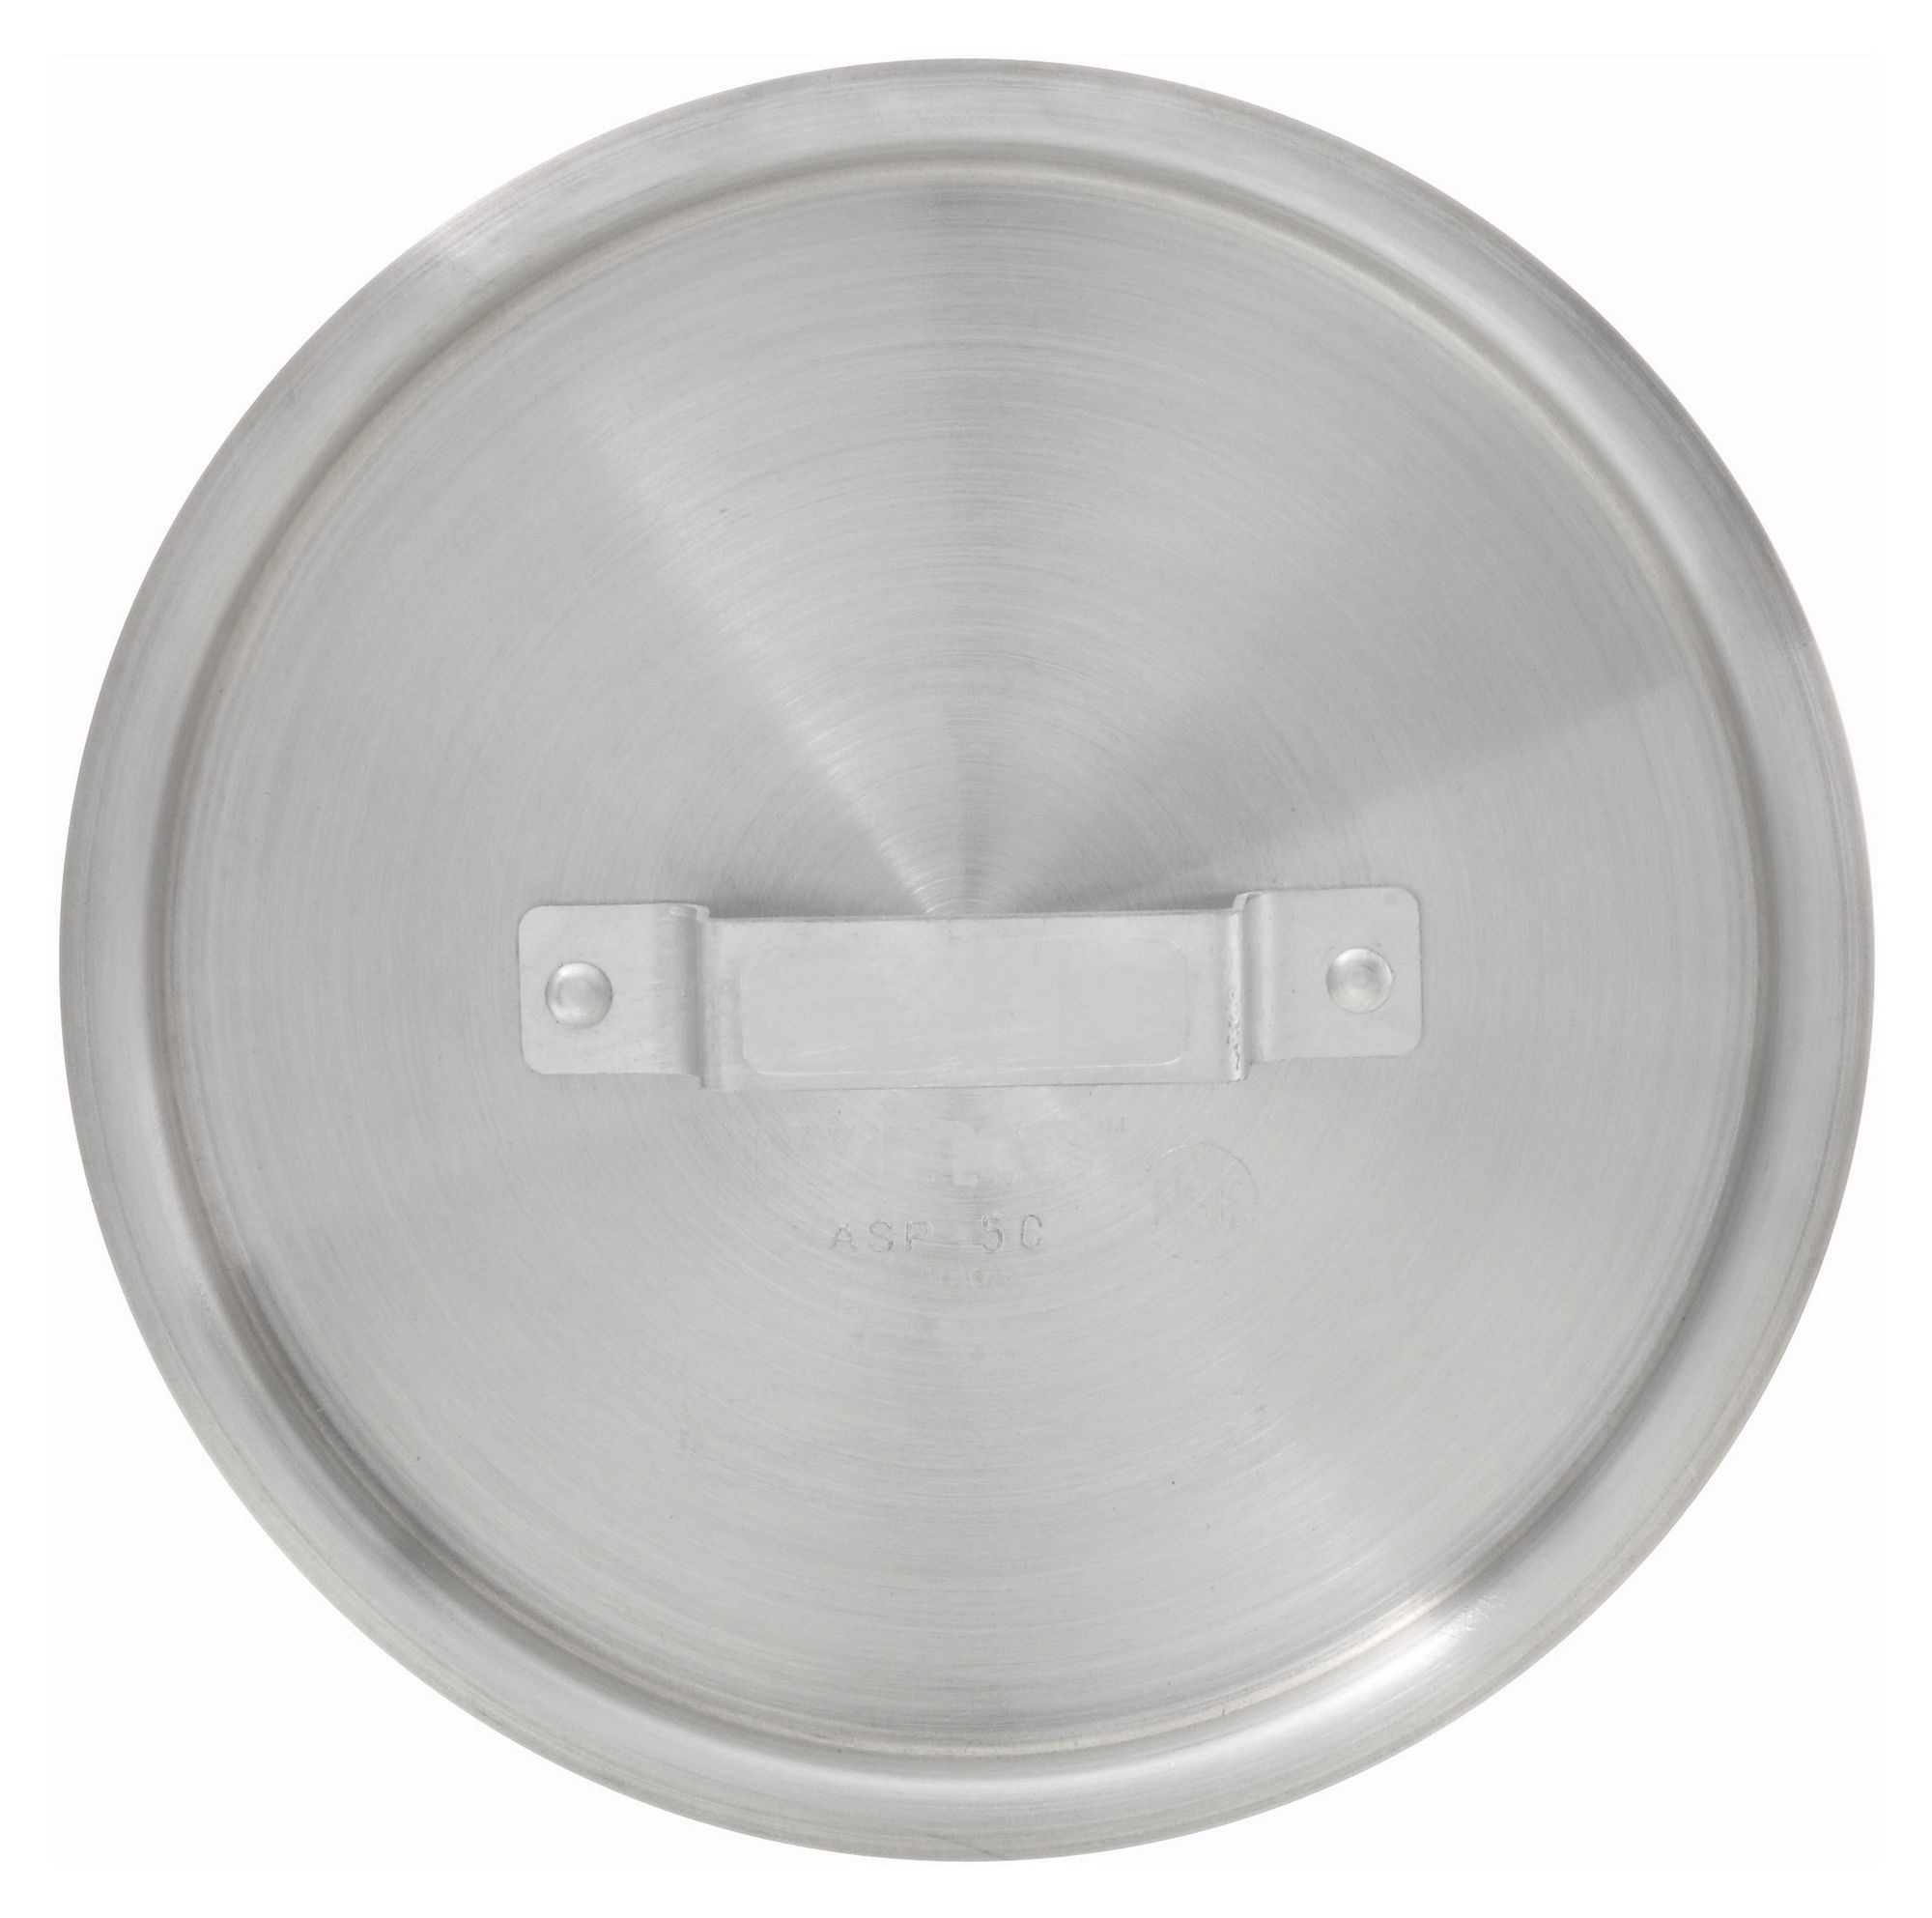 Aluminum Lid For 1-Qt Sauce Pan (ASP-1)